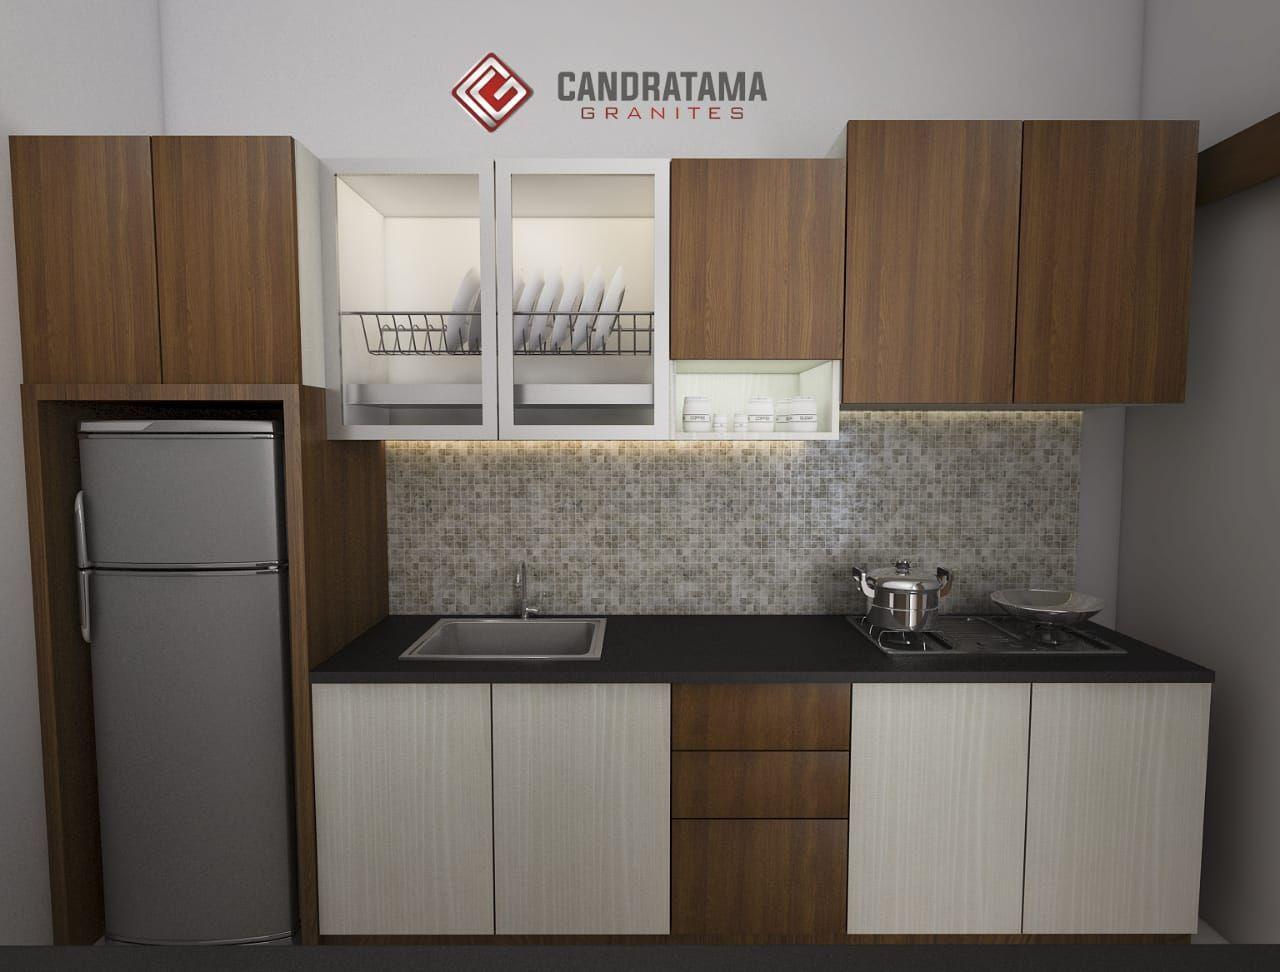 Desain Dapur Model Lurus Cek Bahan Bangunan